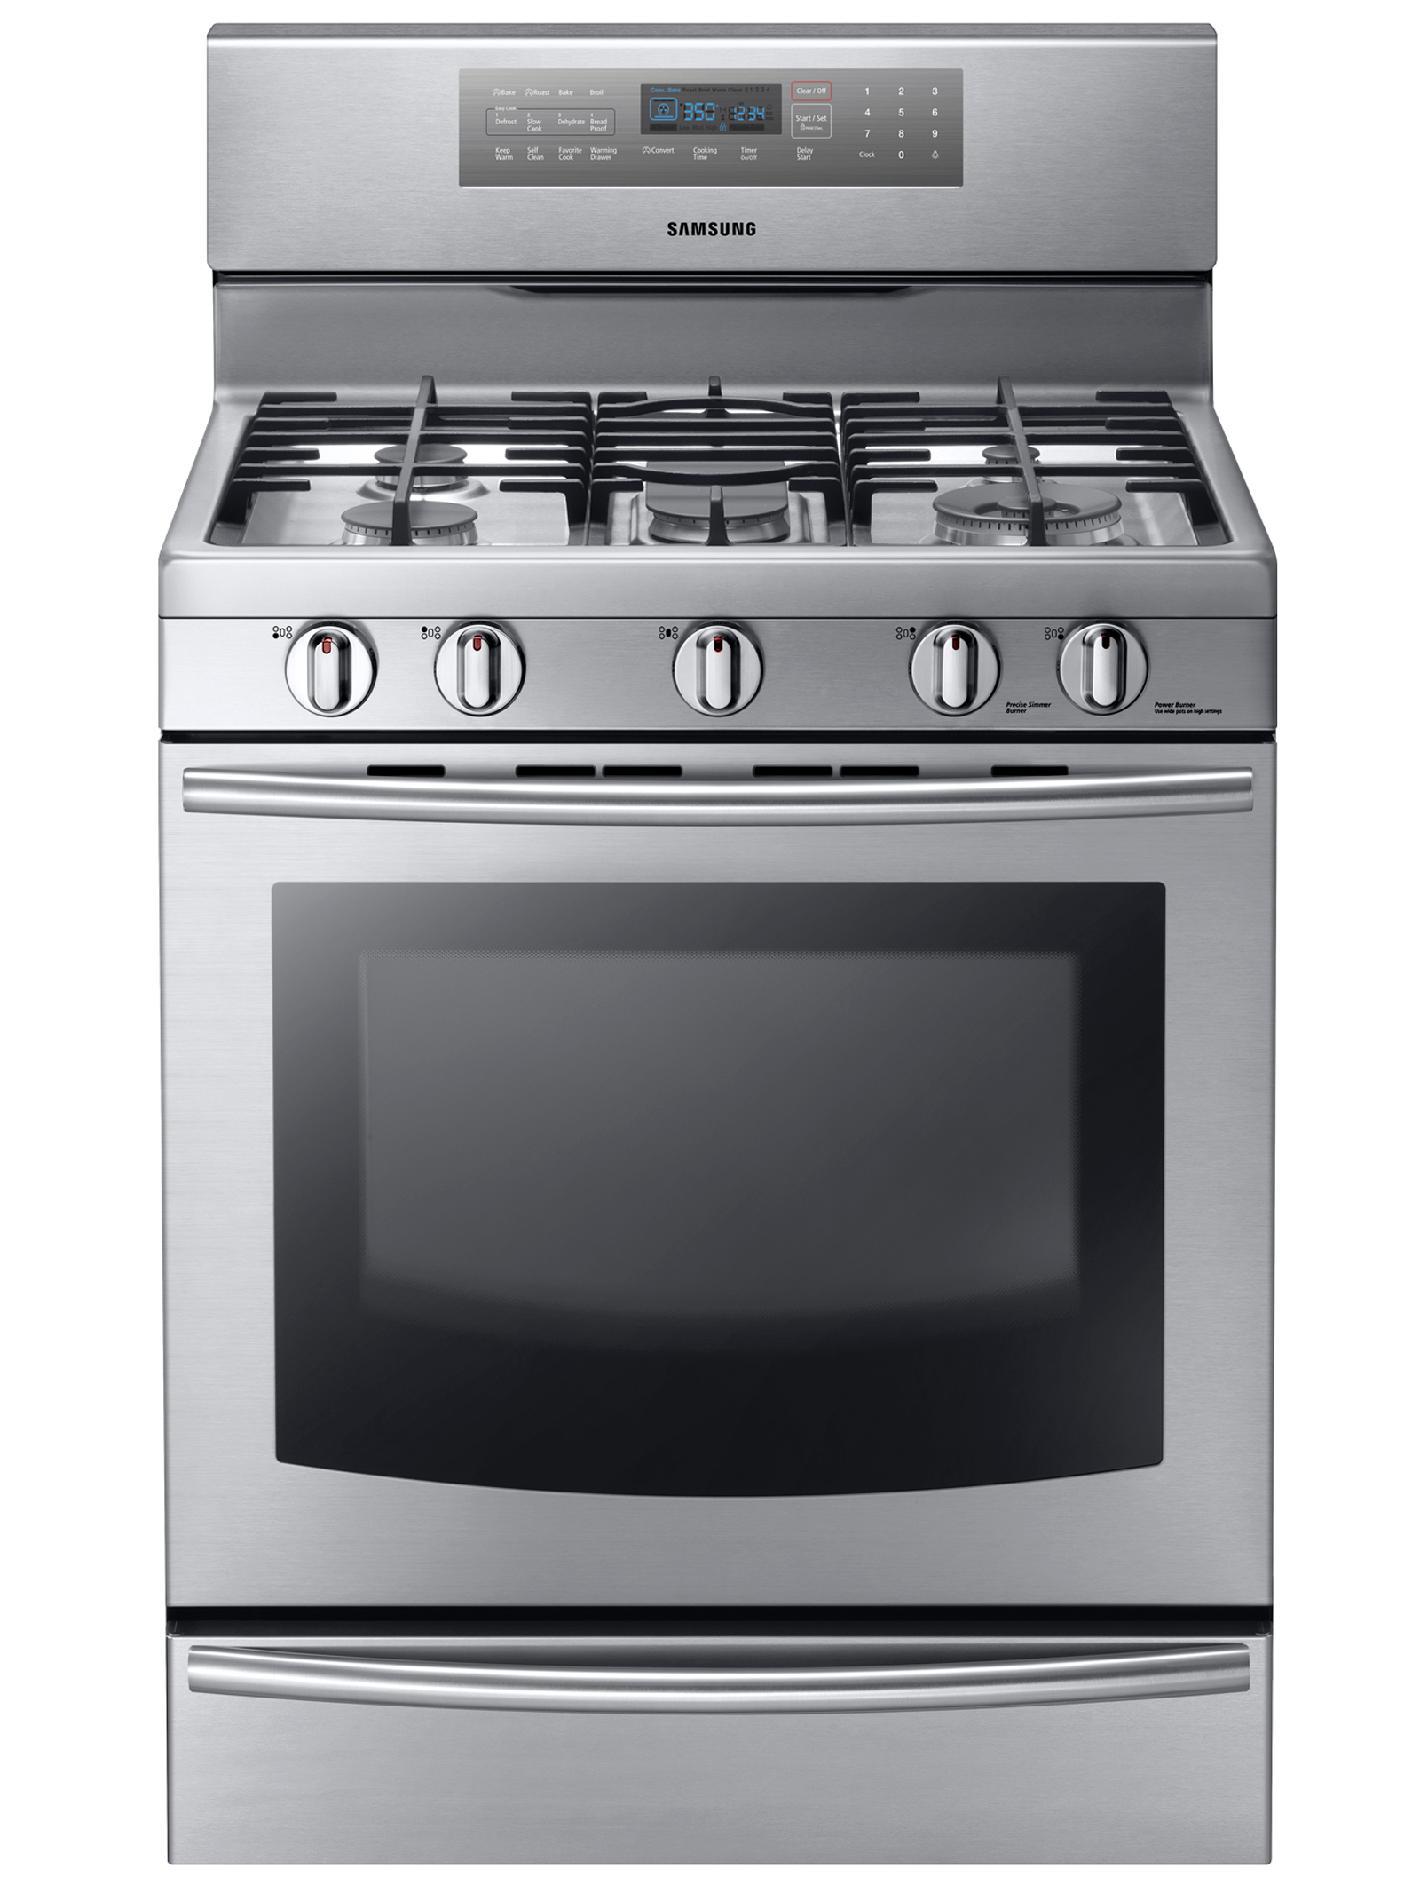 Samsung NX58F5700WS 58 cu ft Gas Range w True